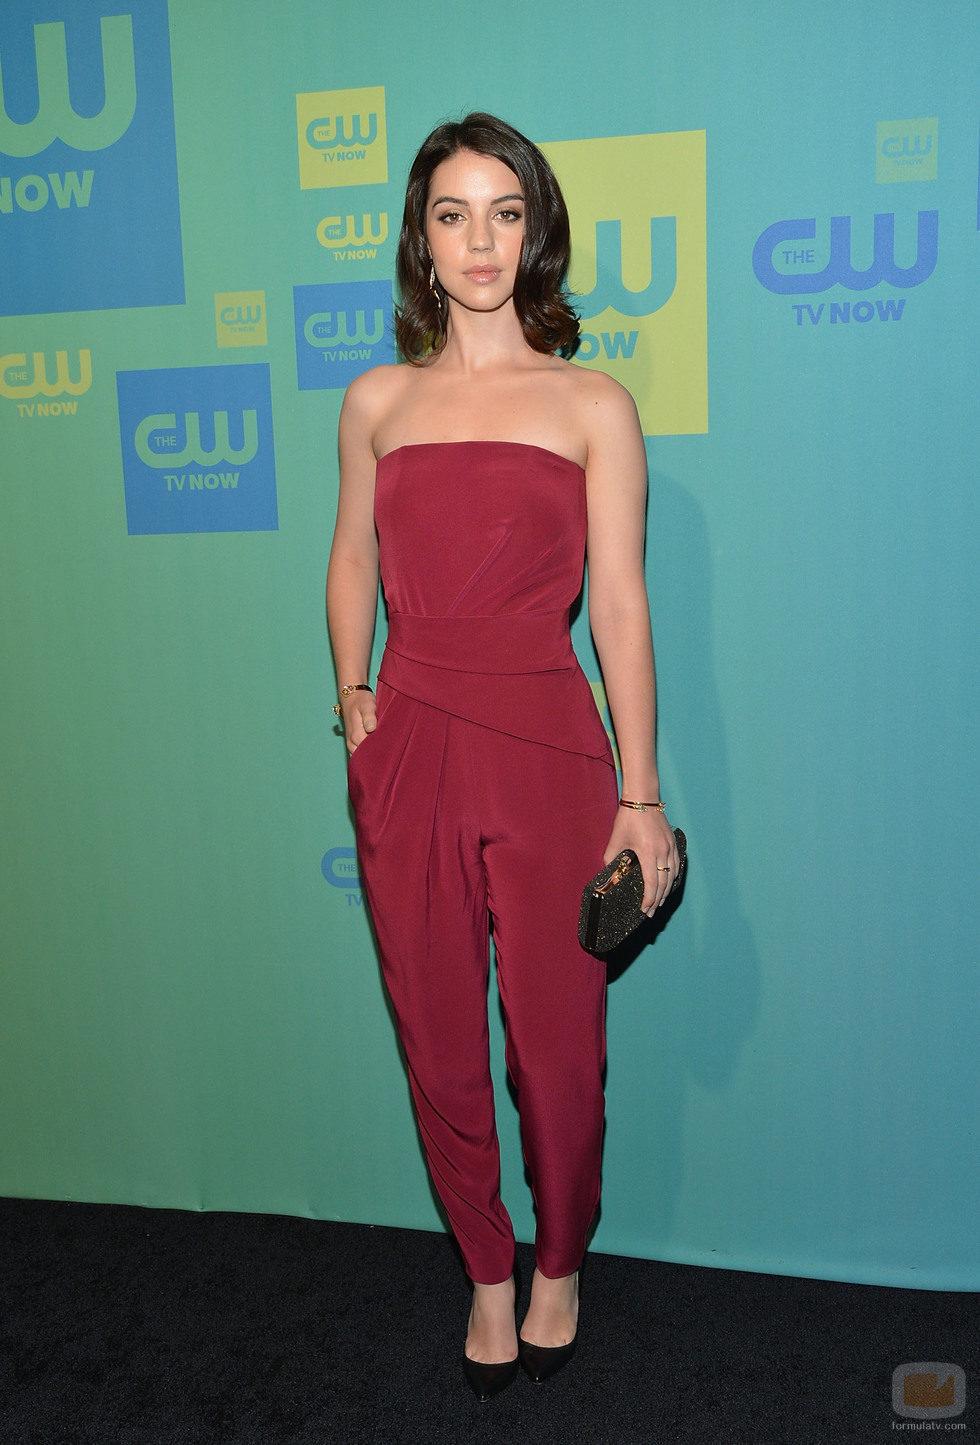 Adelaide Kane ('Reign') en los Upfronts 2014 de The CW